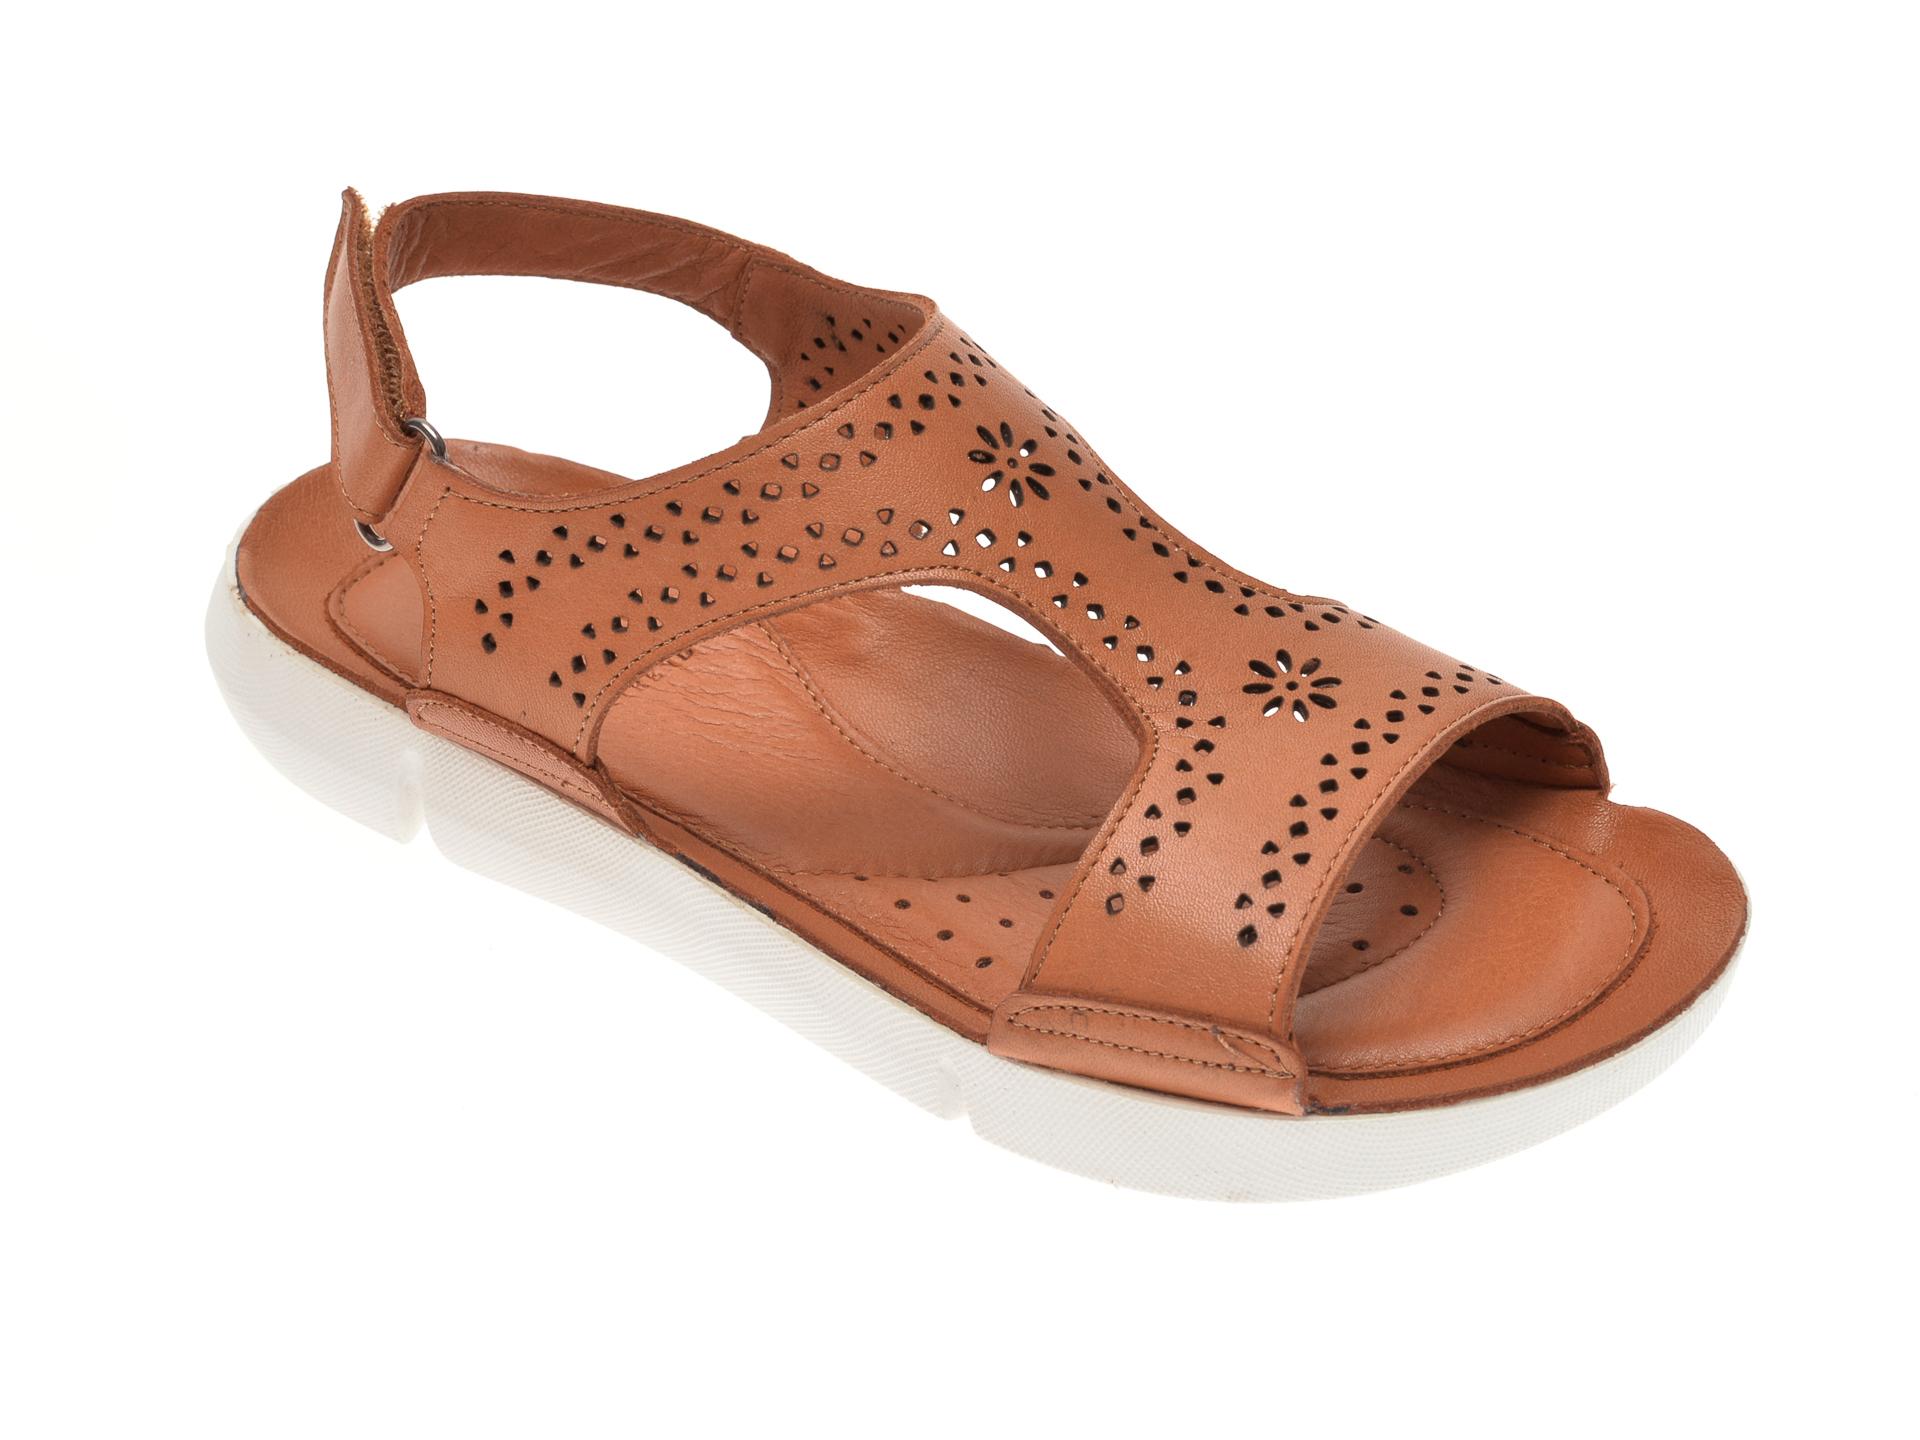 Sandale X TREND maro, 60001, din piele naturala